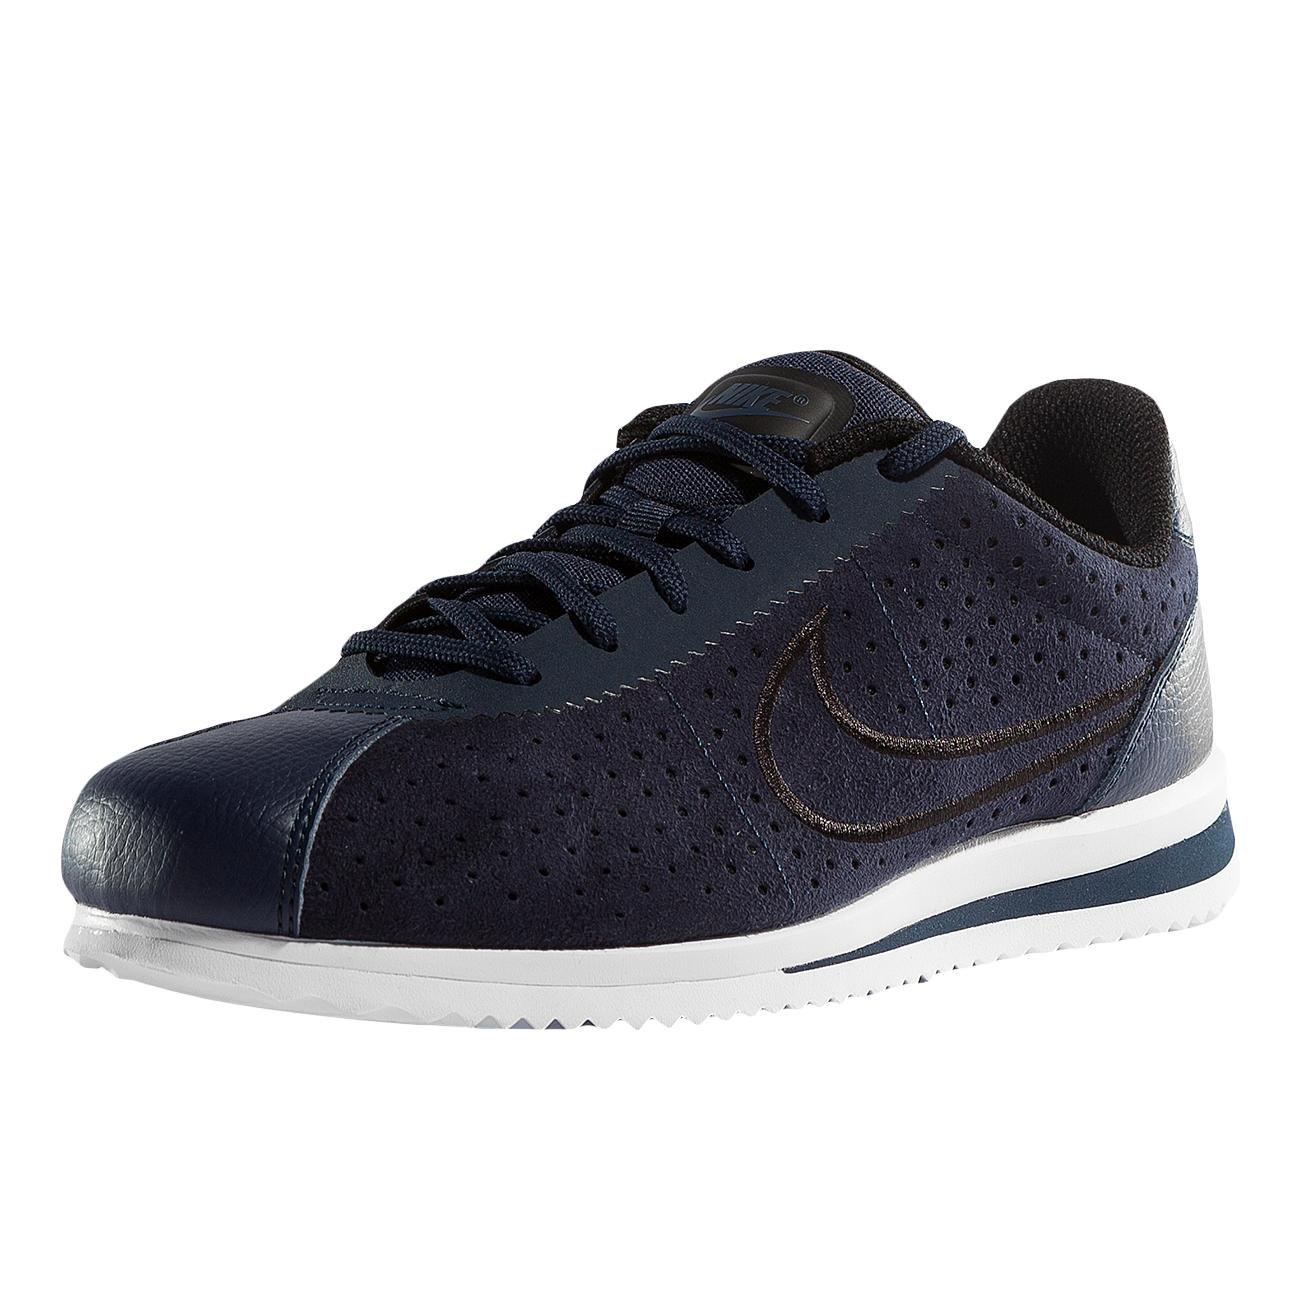 Nike Unisex Erwachsene Zapatillas Cortez Ultra Moire Fitnessschuhe  Marineblau Mehrfarbig Multicolor 918207 400